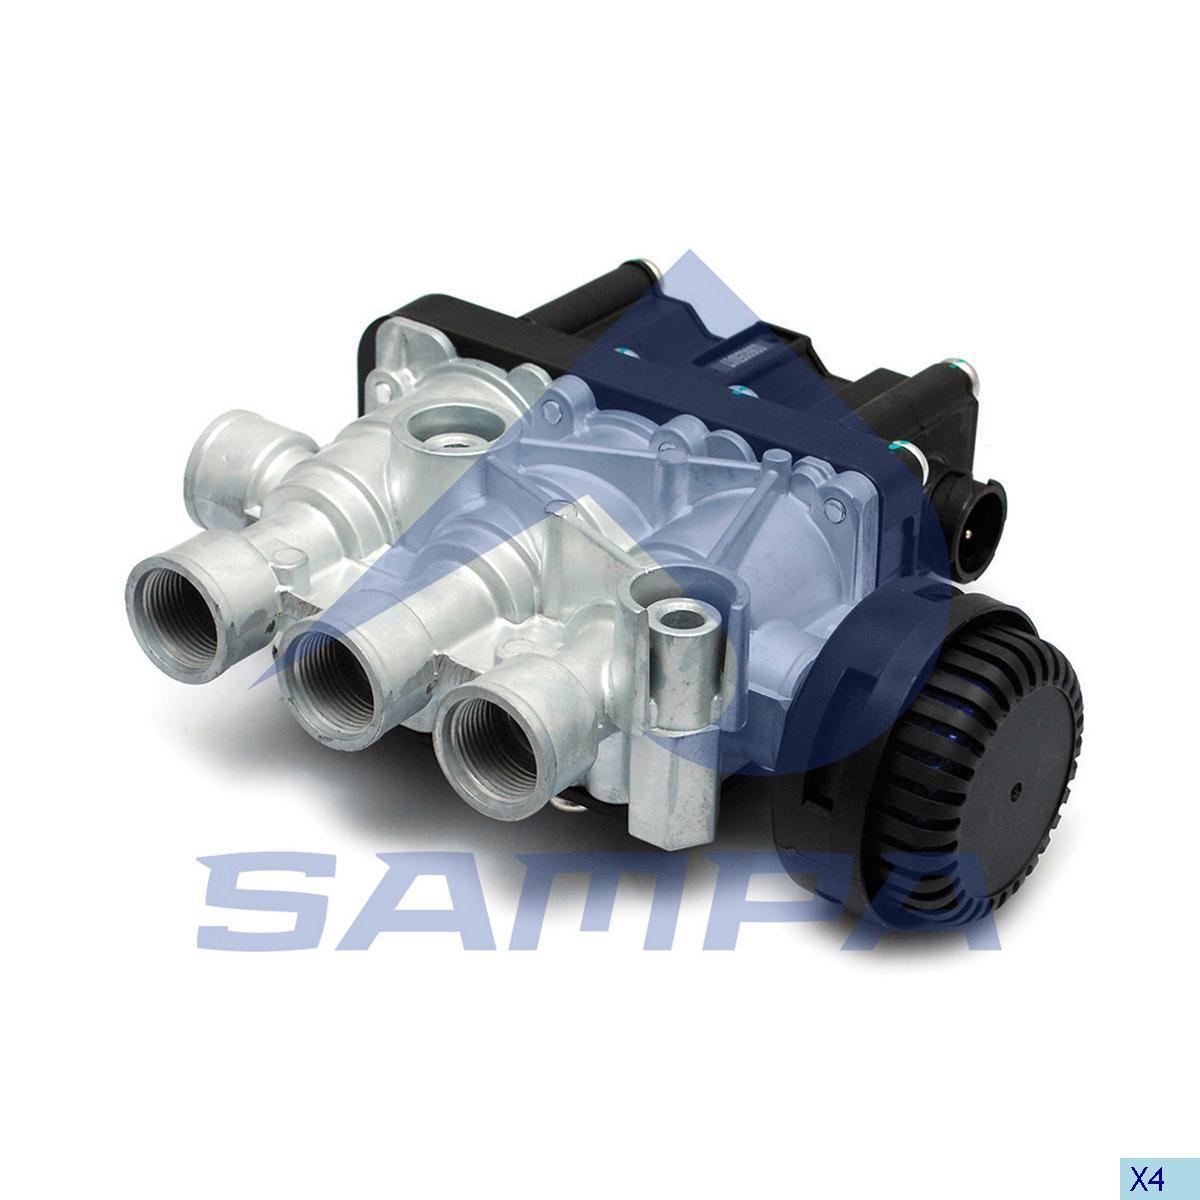 Solenoid Valve, Volvo, Compressed Air System